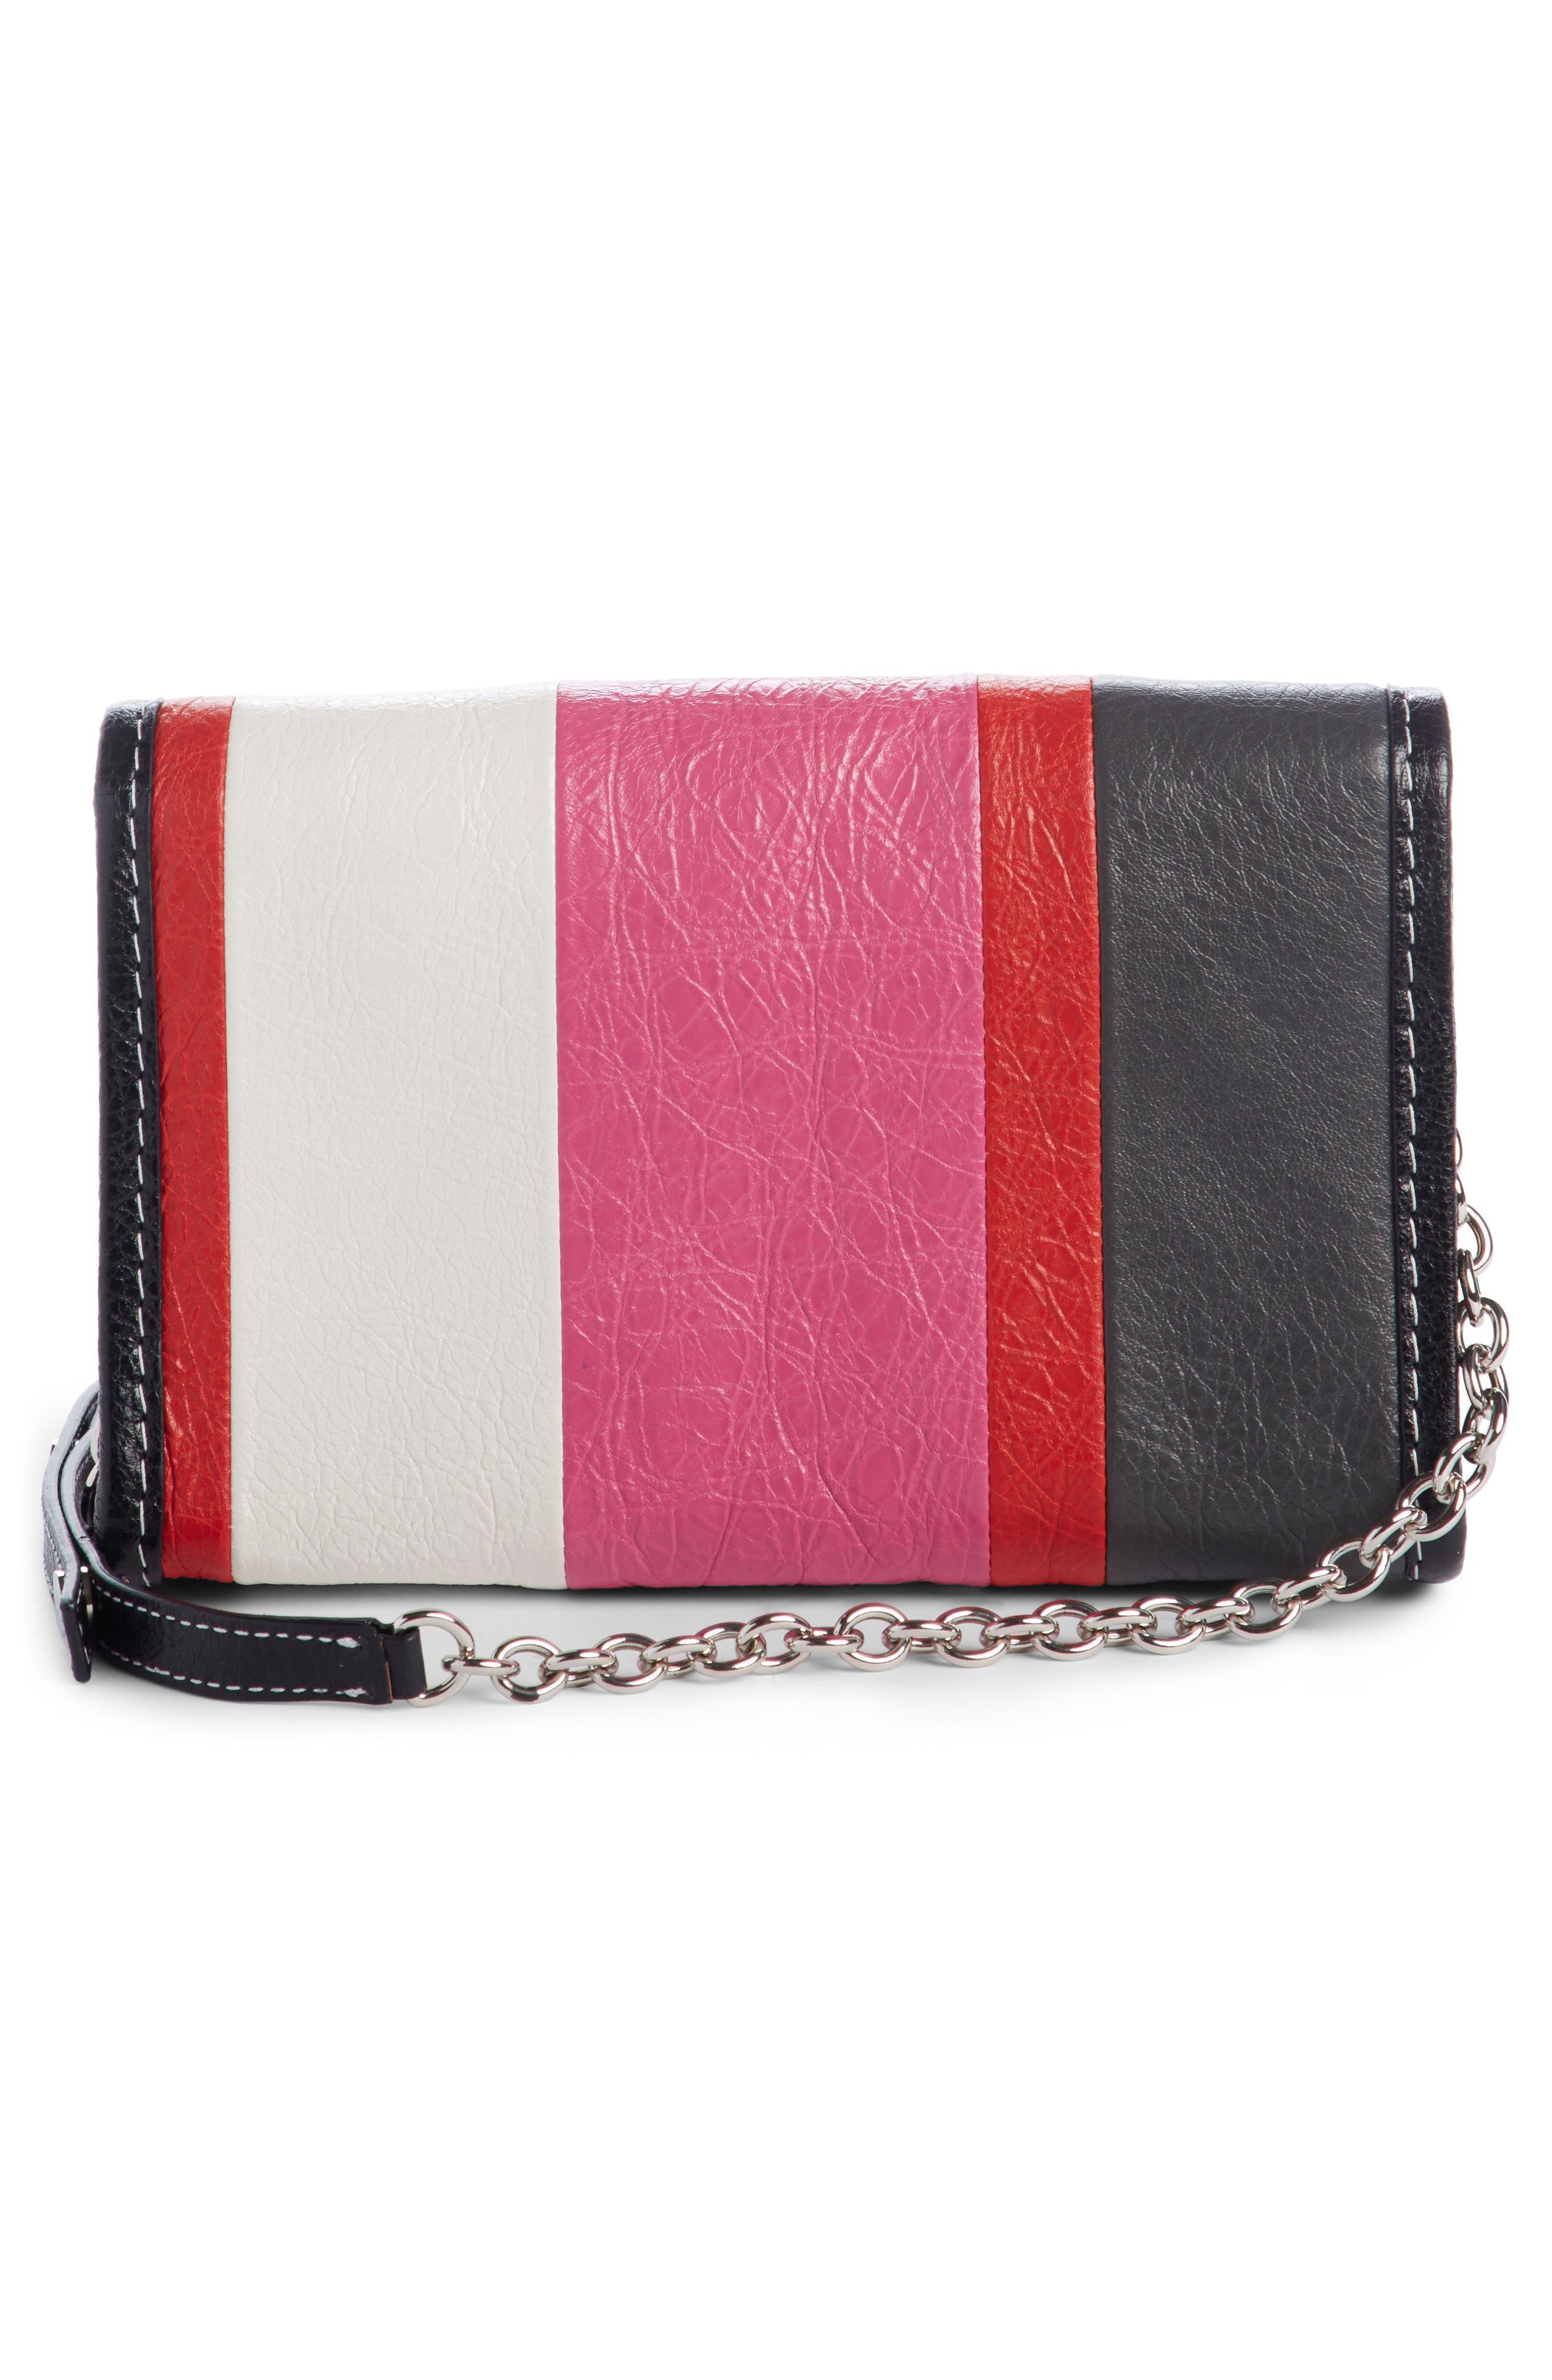 Bazar Leather Wallet on a Chain,                             Alternate thumbnail 2, color,                             Rose Gris Fssil Blu Noir Roug